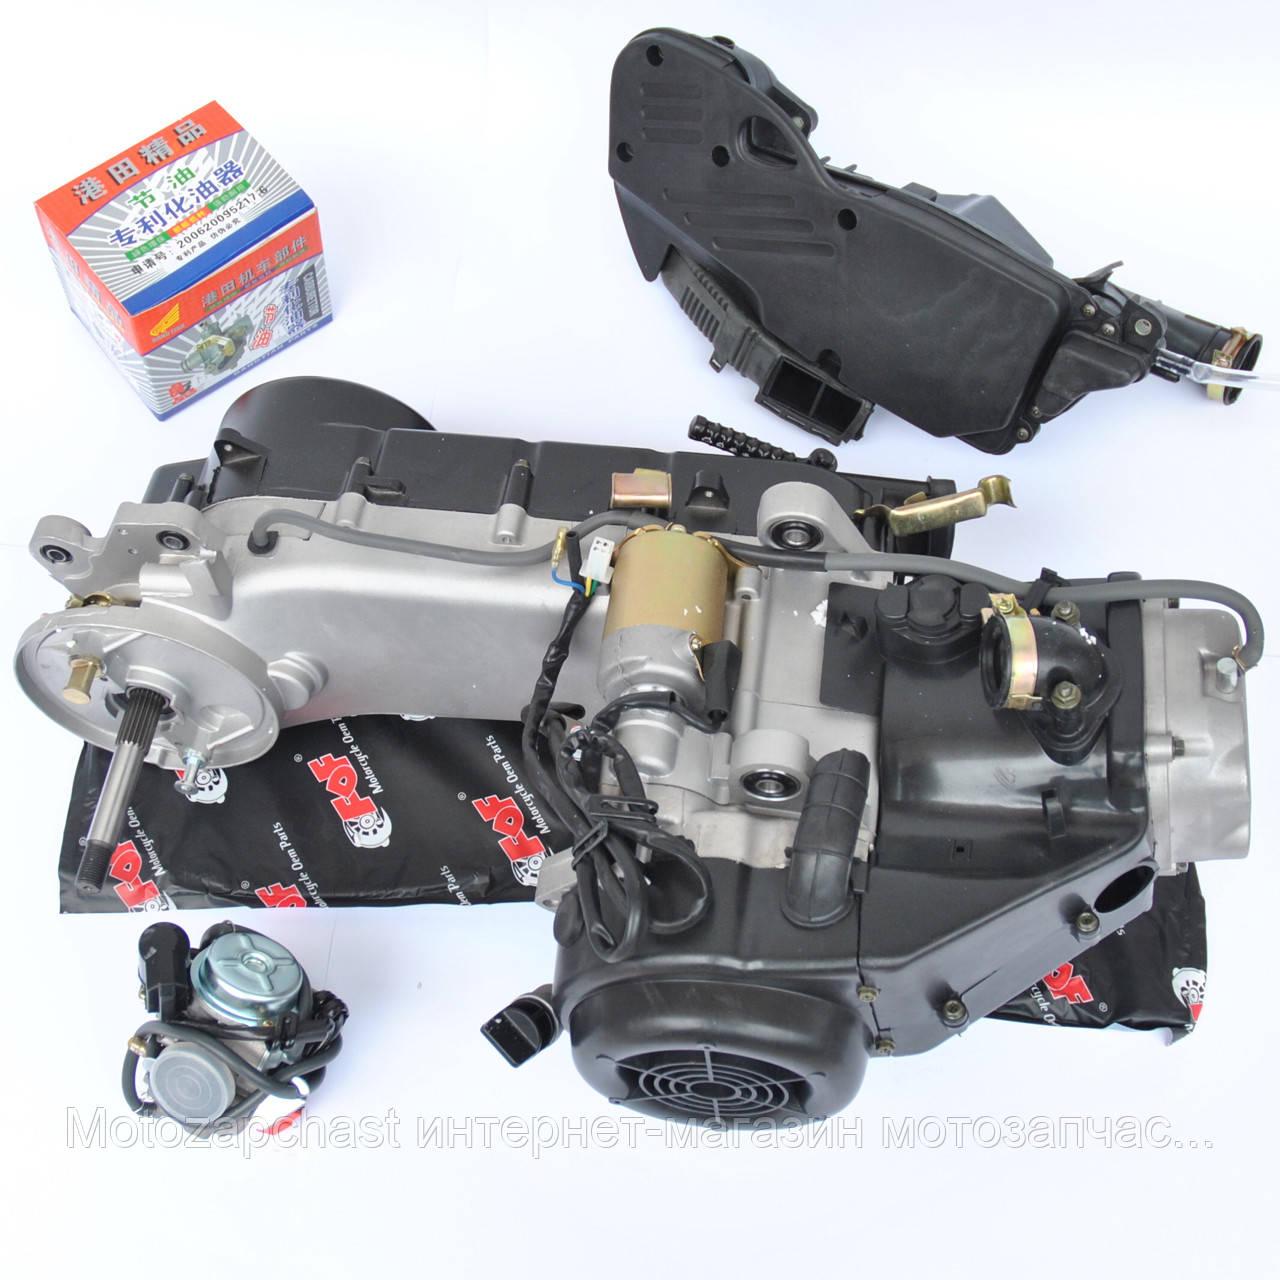 Двигатель Viper Storm 150/GY-180 см3 d-61 мм MARATHON